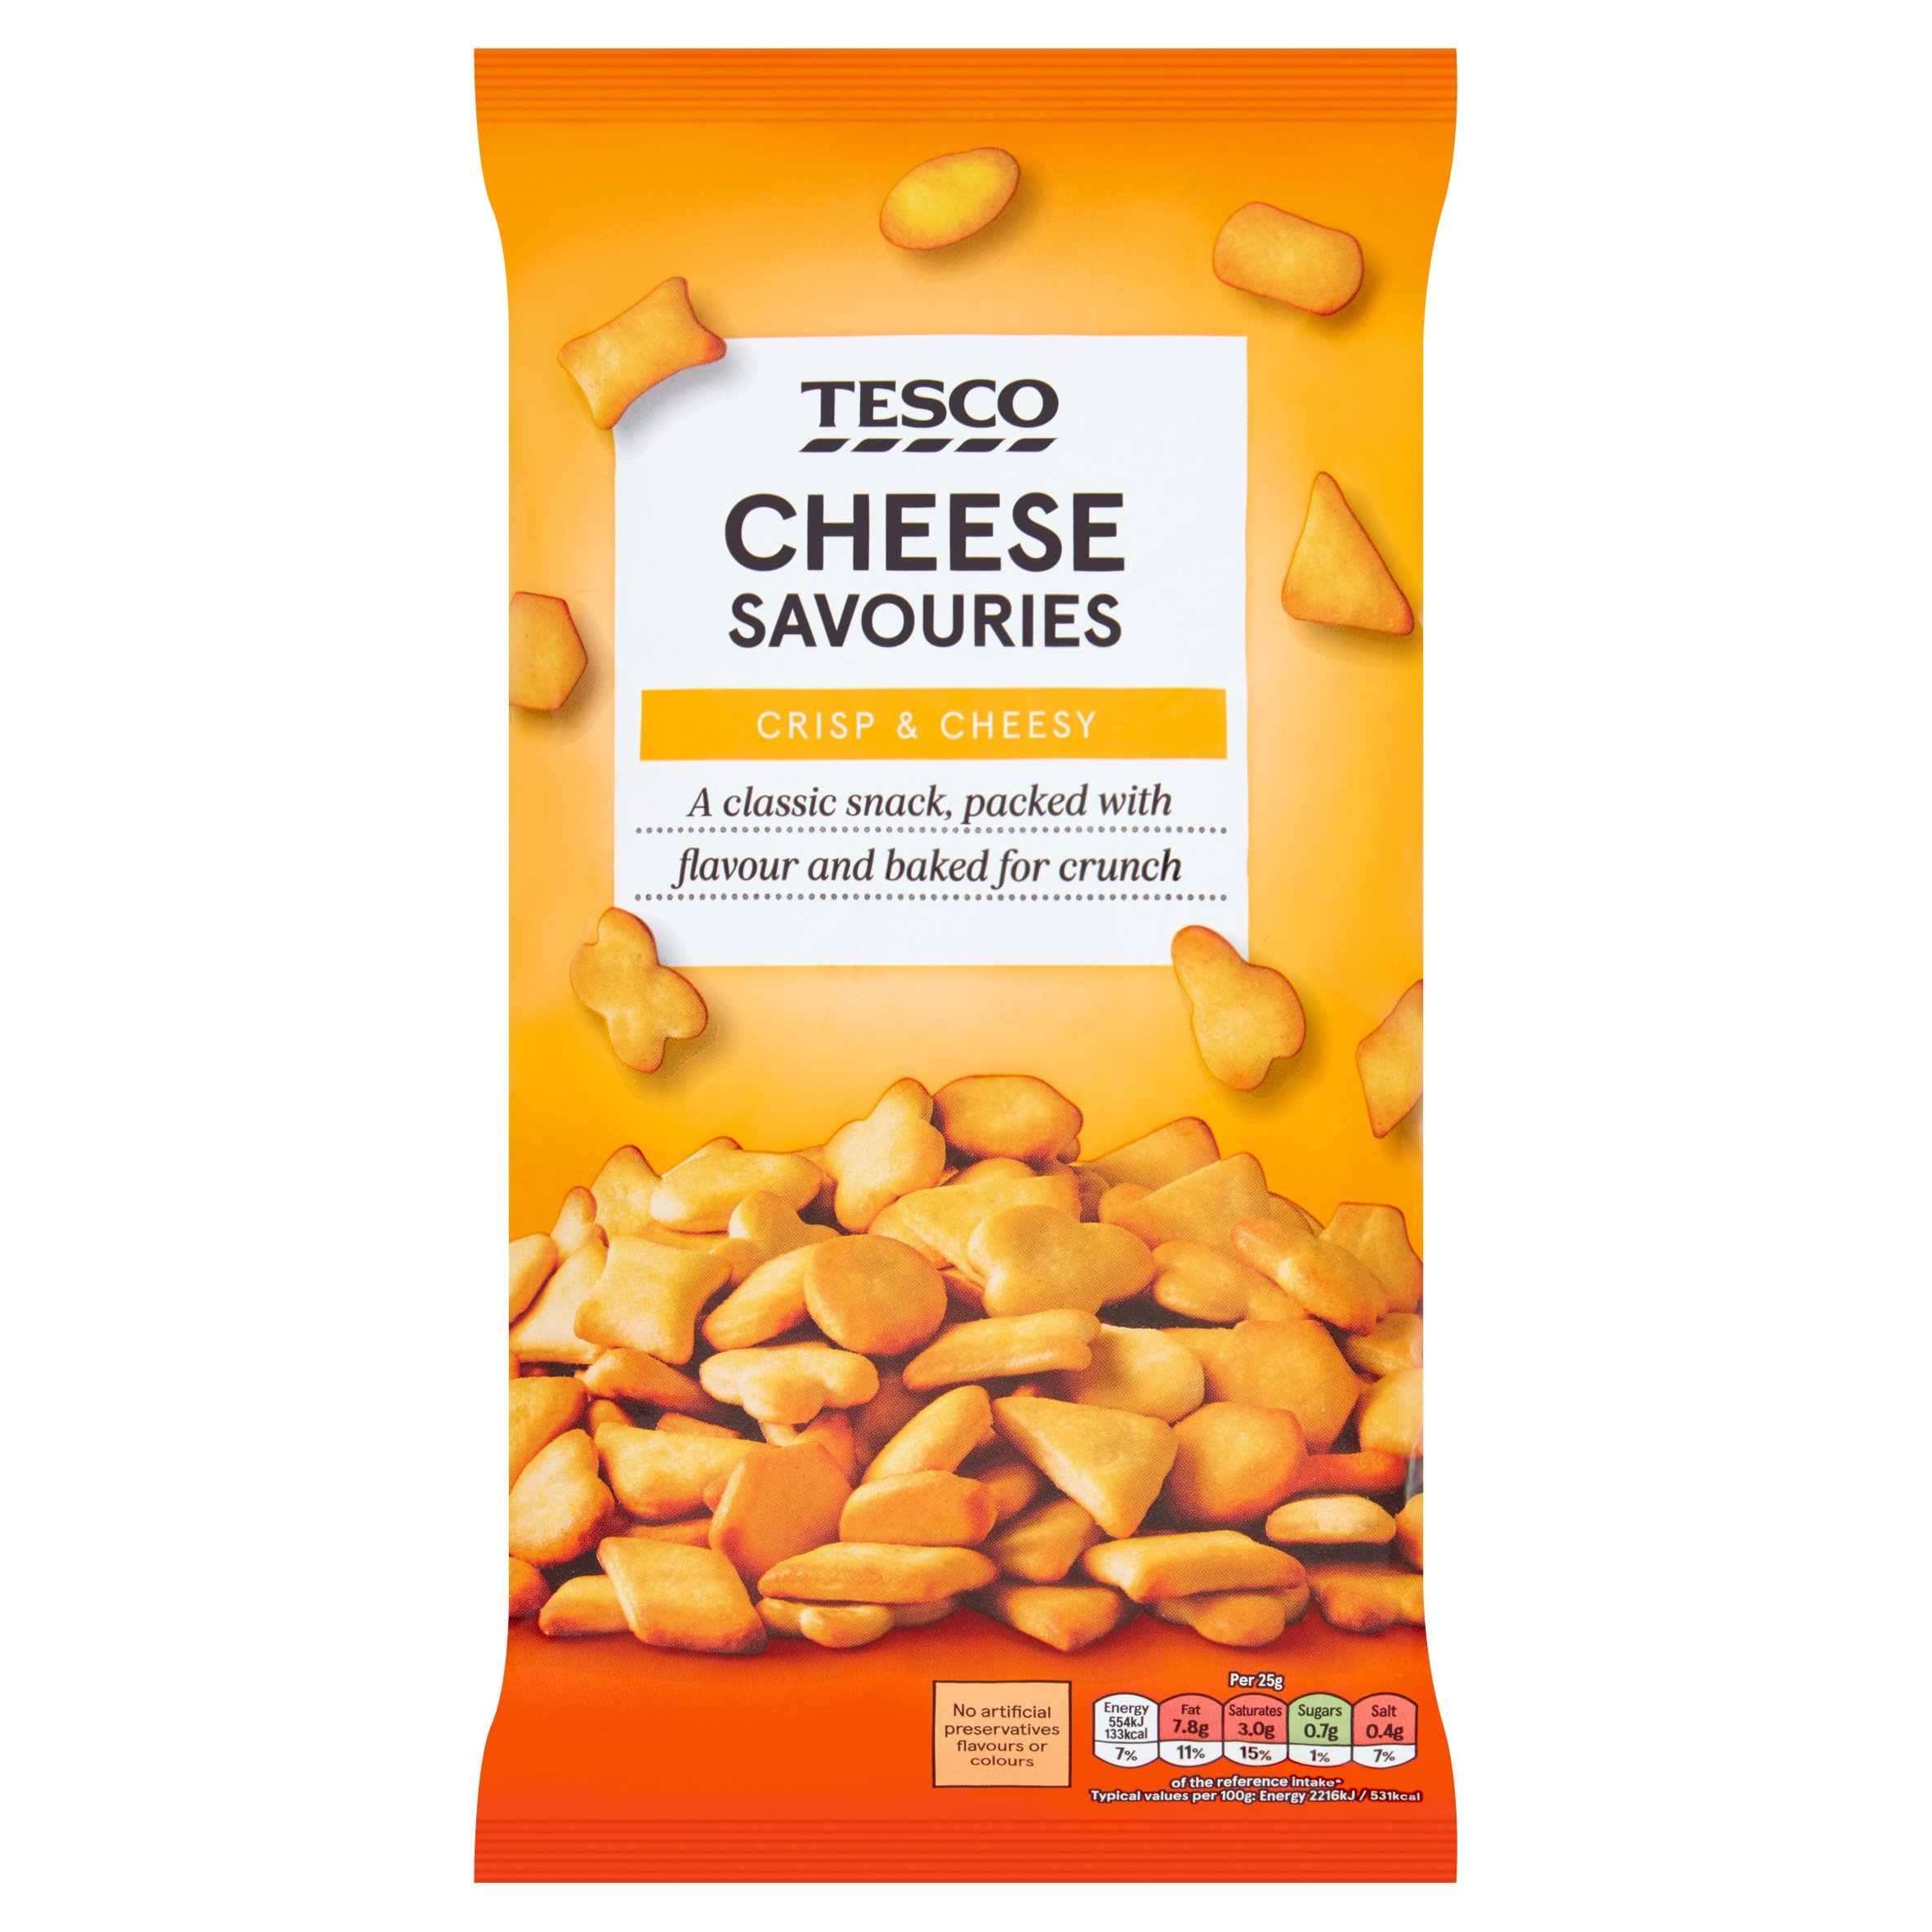 Tesco Cheese Savouries Snacks 250G